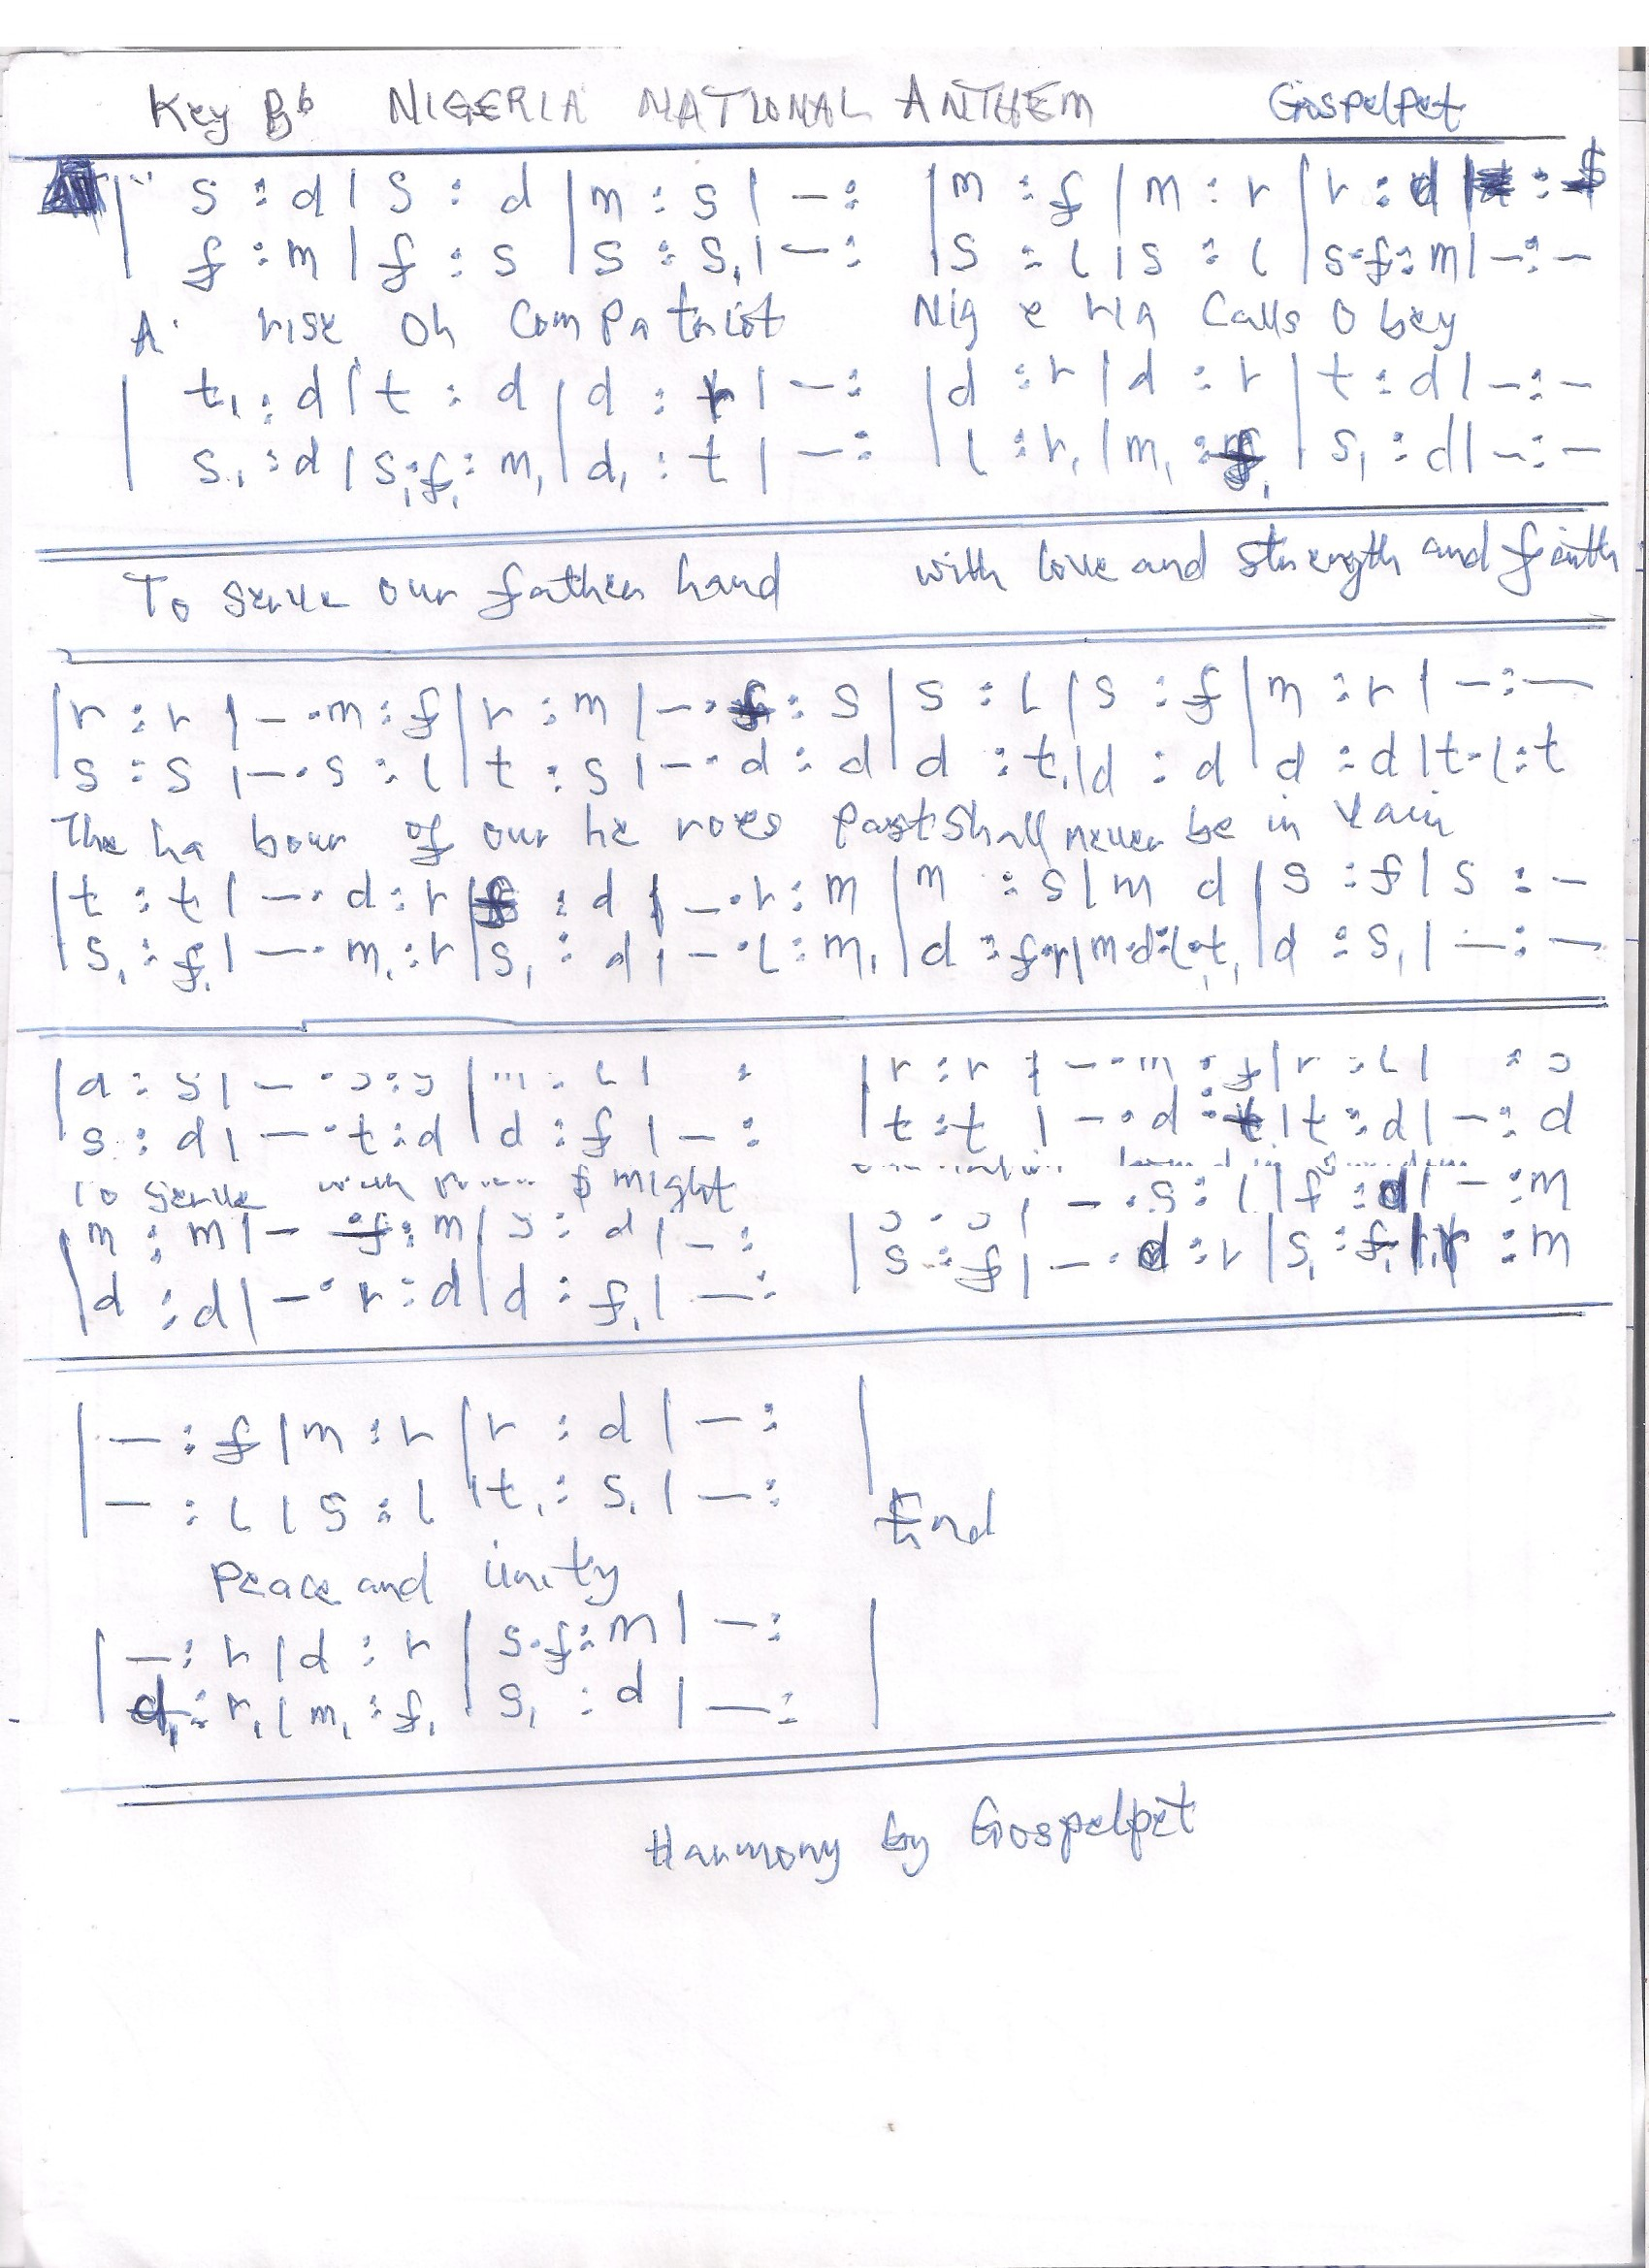 Nigeria national anthem in treble alto tenor and bass learn the national anthem in treble alto tenor and bass for choir or quartet presentations hexwebz Choice Image